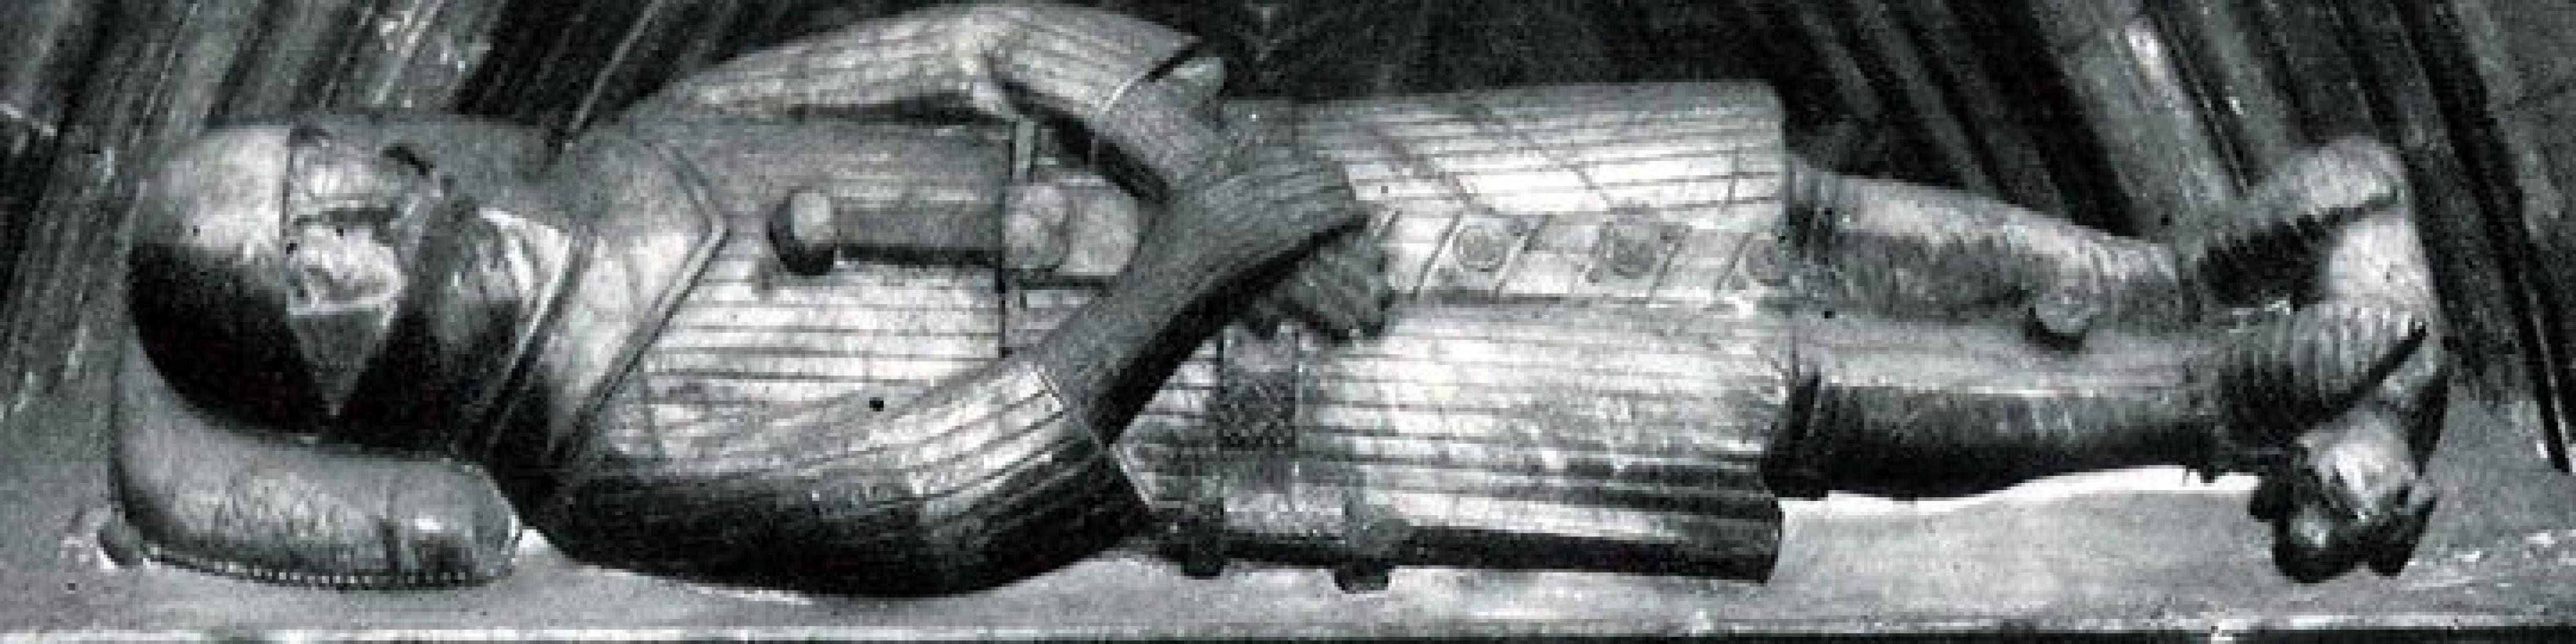 Steel gorget : Historical Sources Image